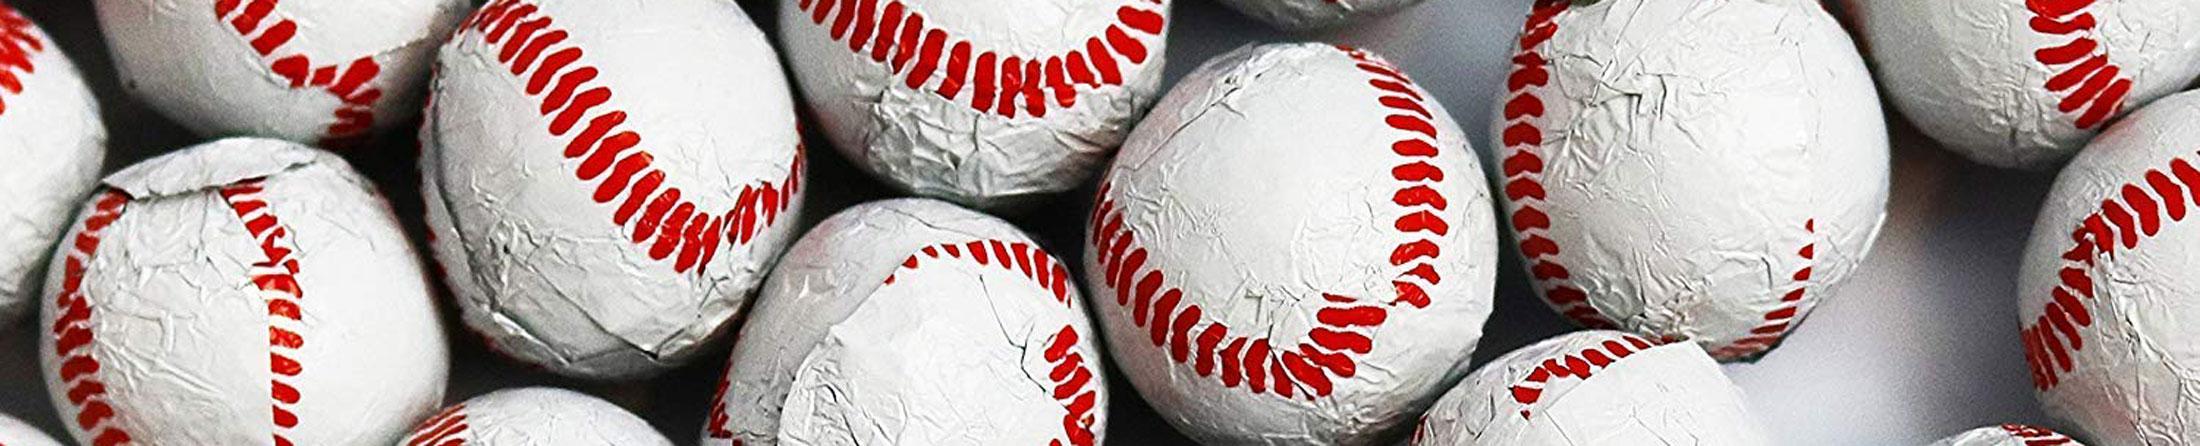 Chocolate Baseballs